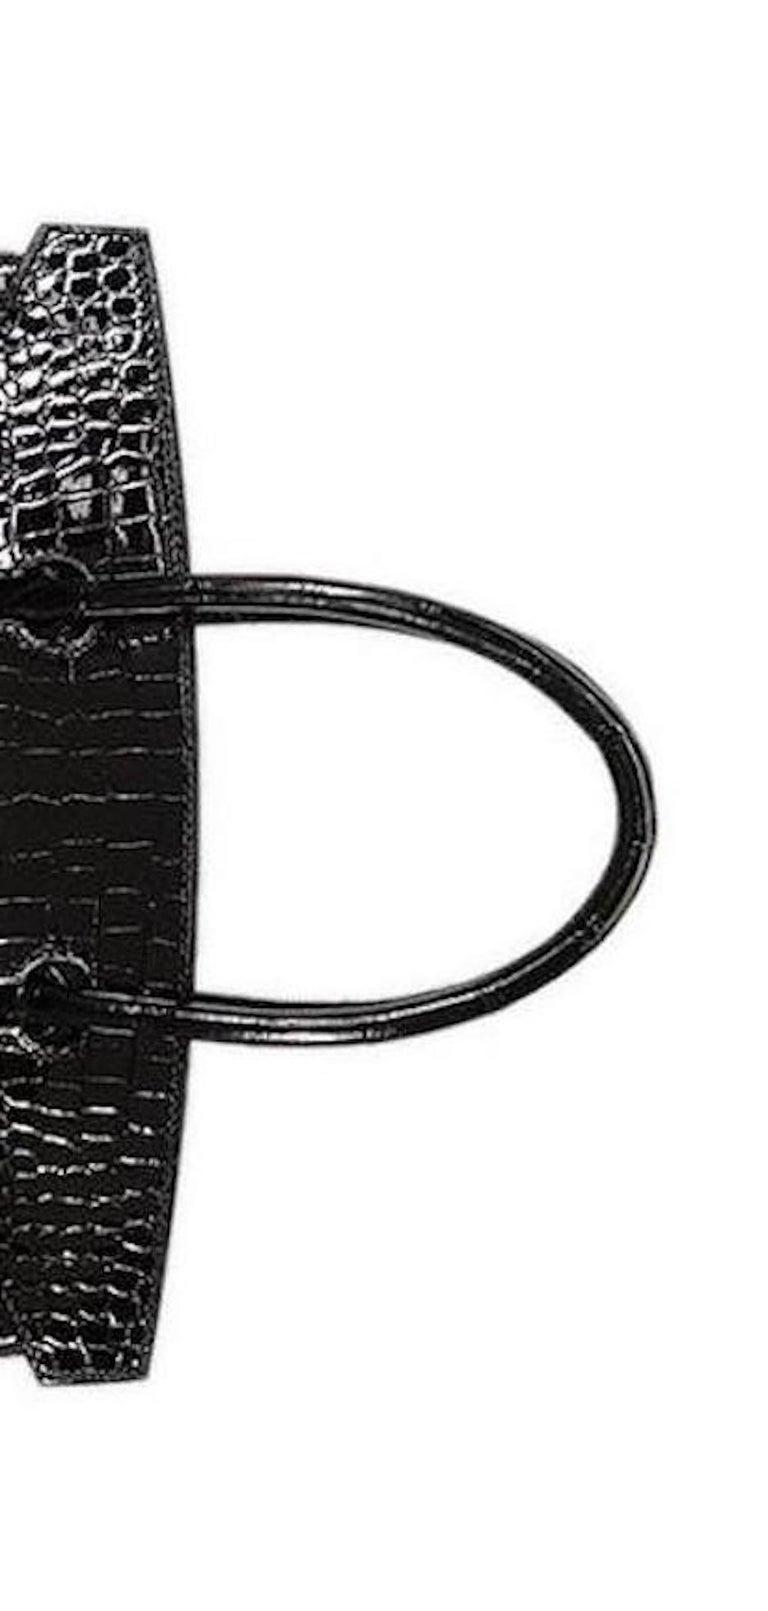 Women's Hermes Birkin 30 NEW Rare Shiny Crocodile Top Handle Satchel Tote Bag in Box For Sale